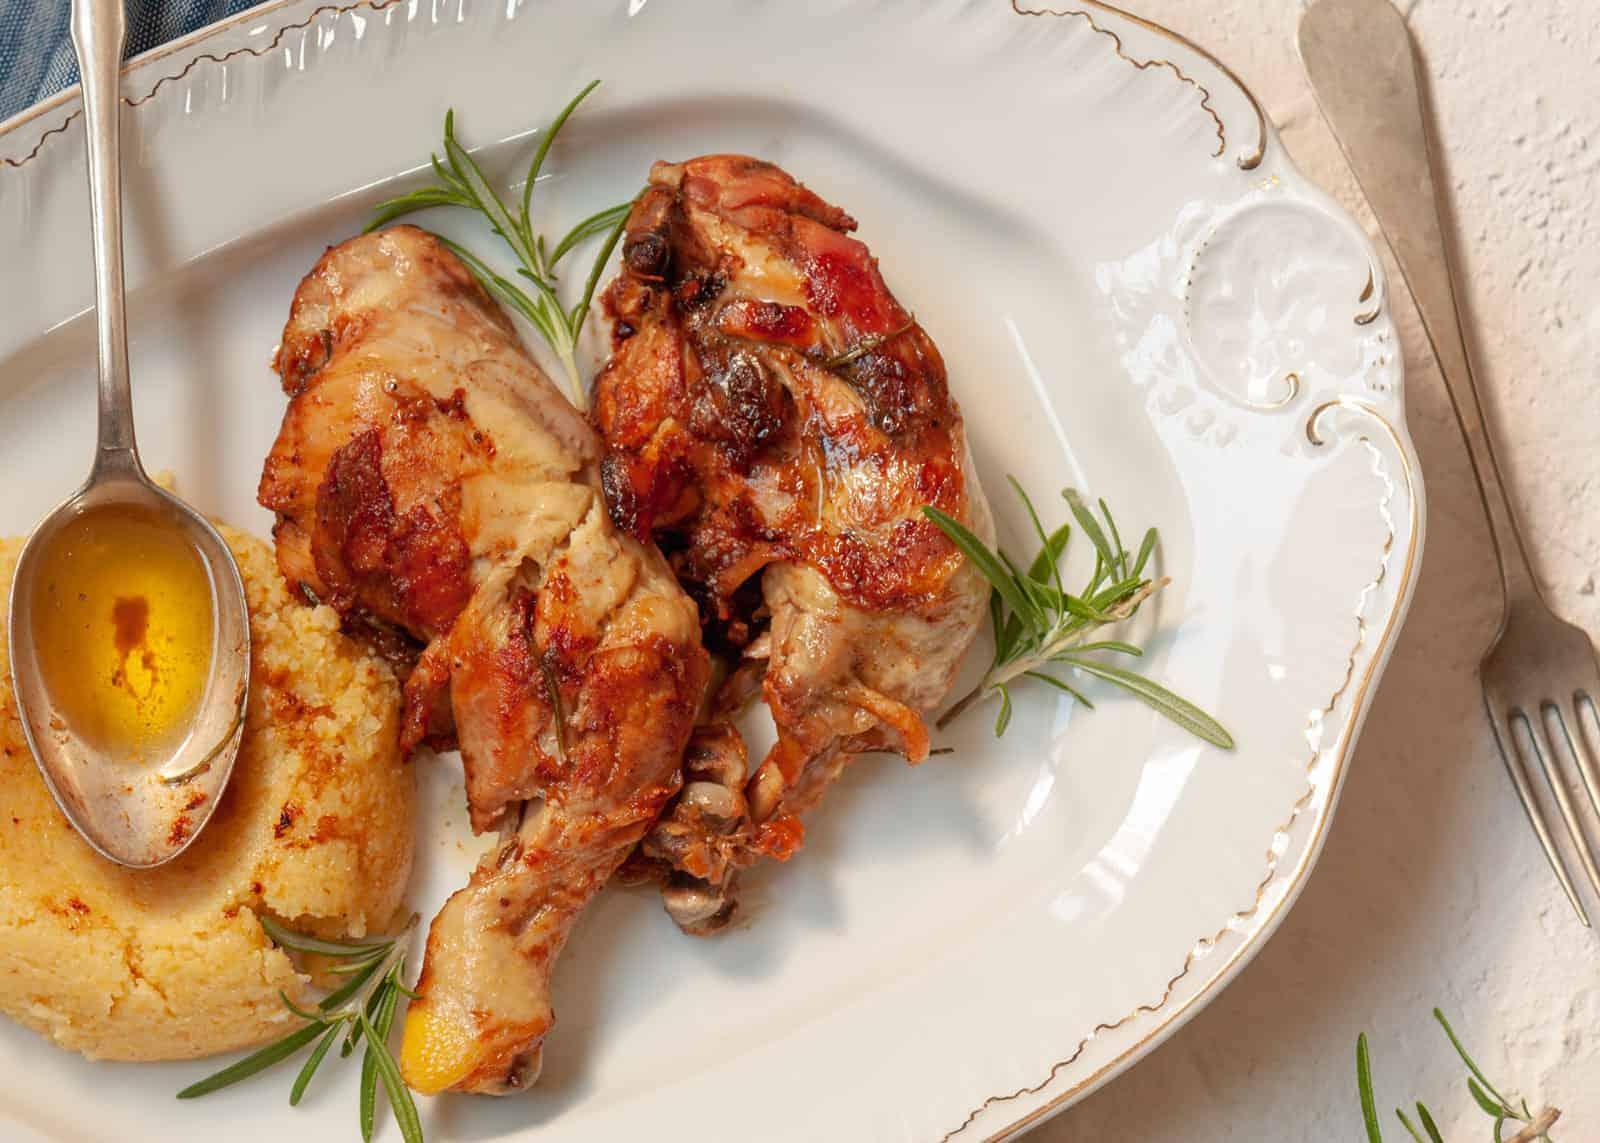 braised chicken with rosemary recipe